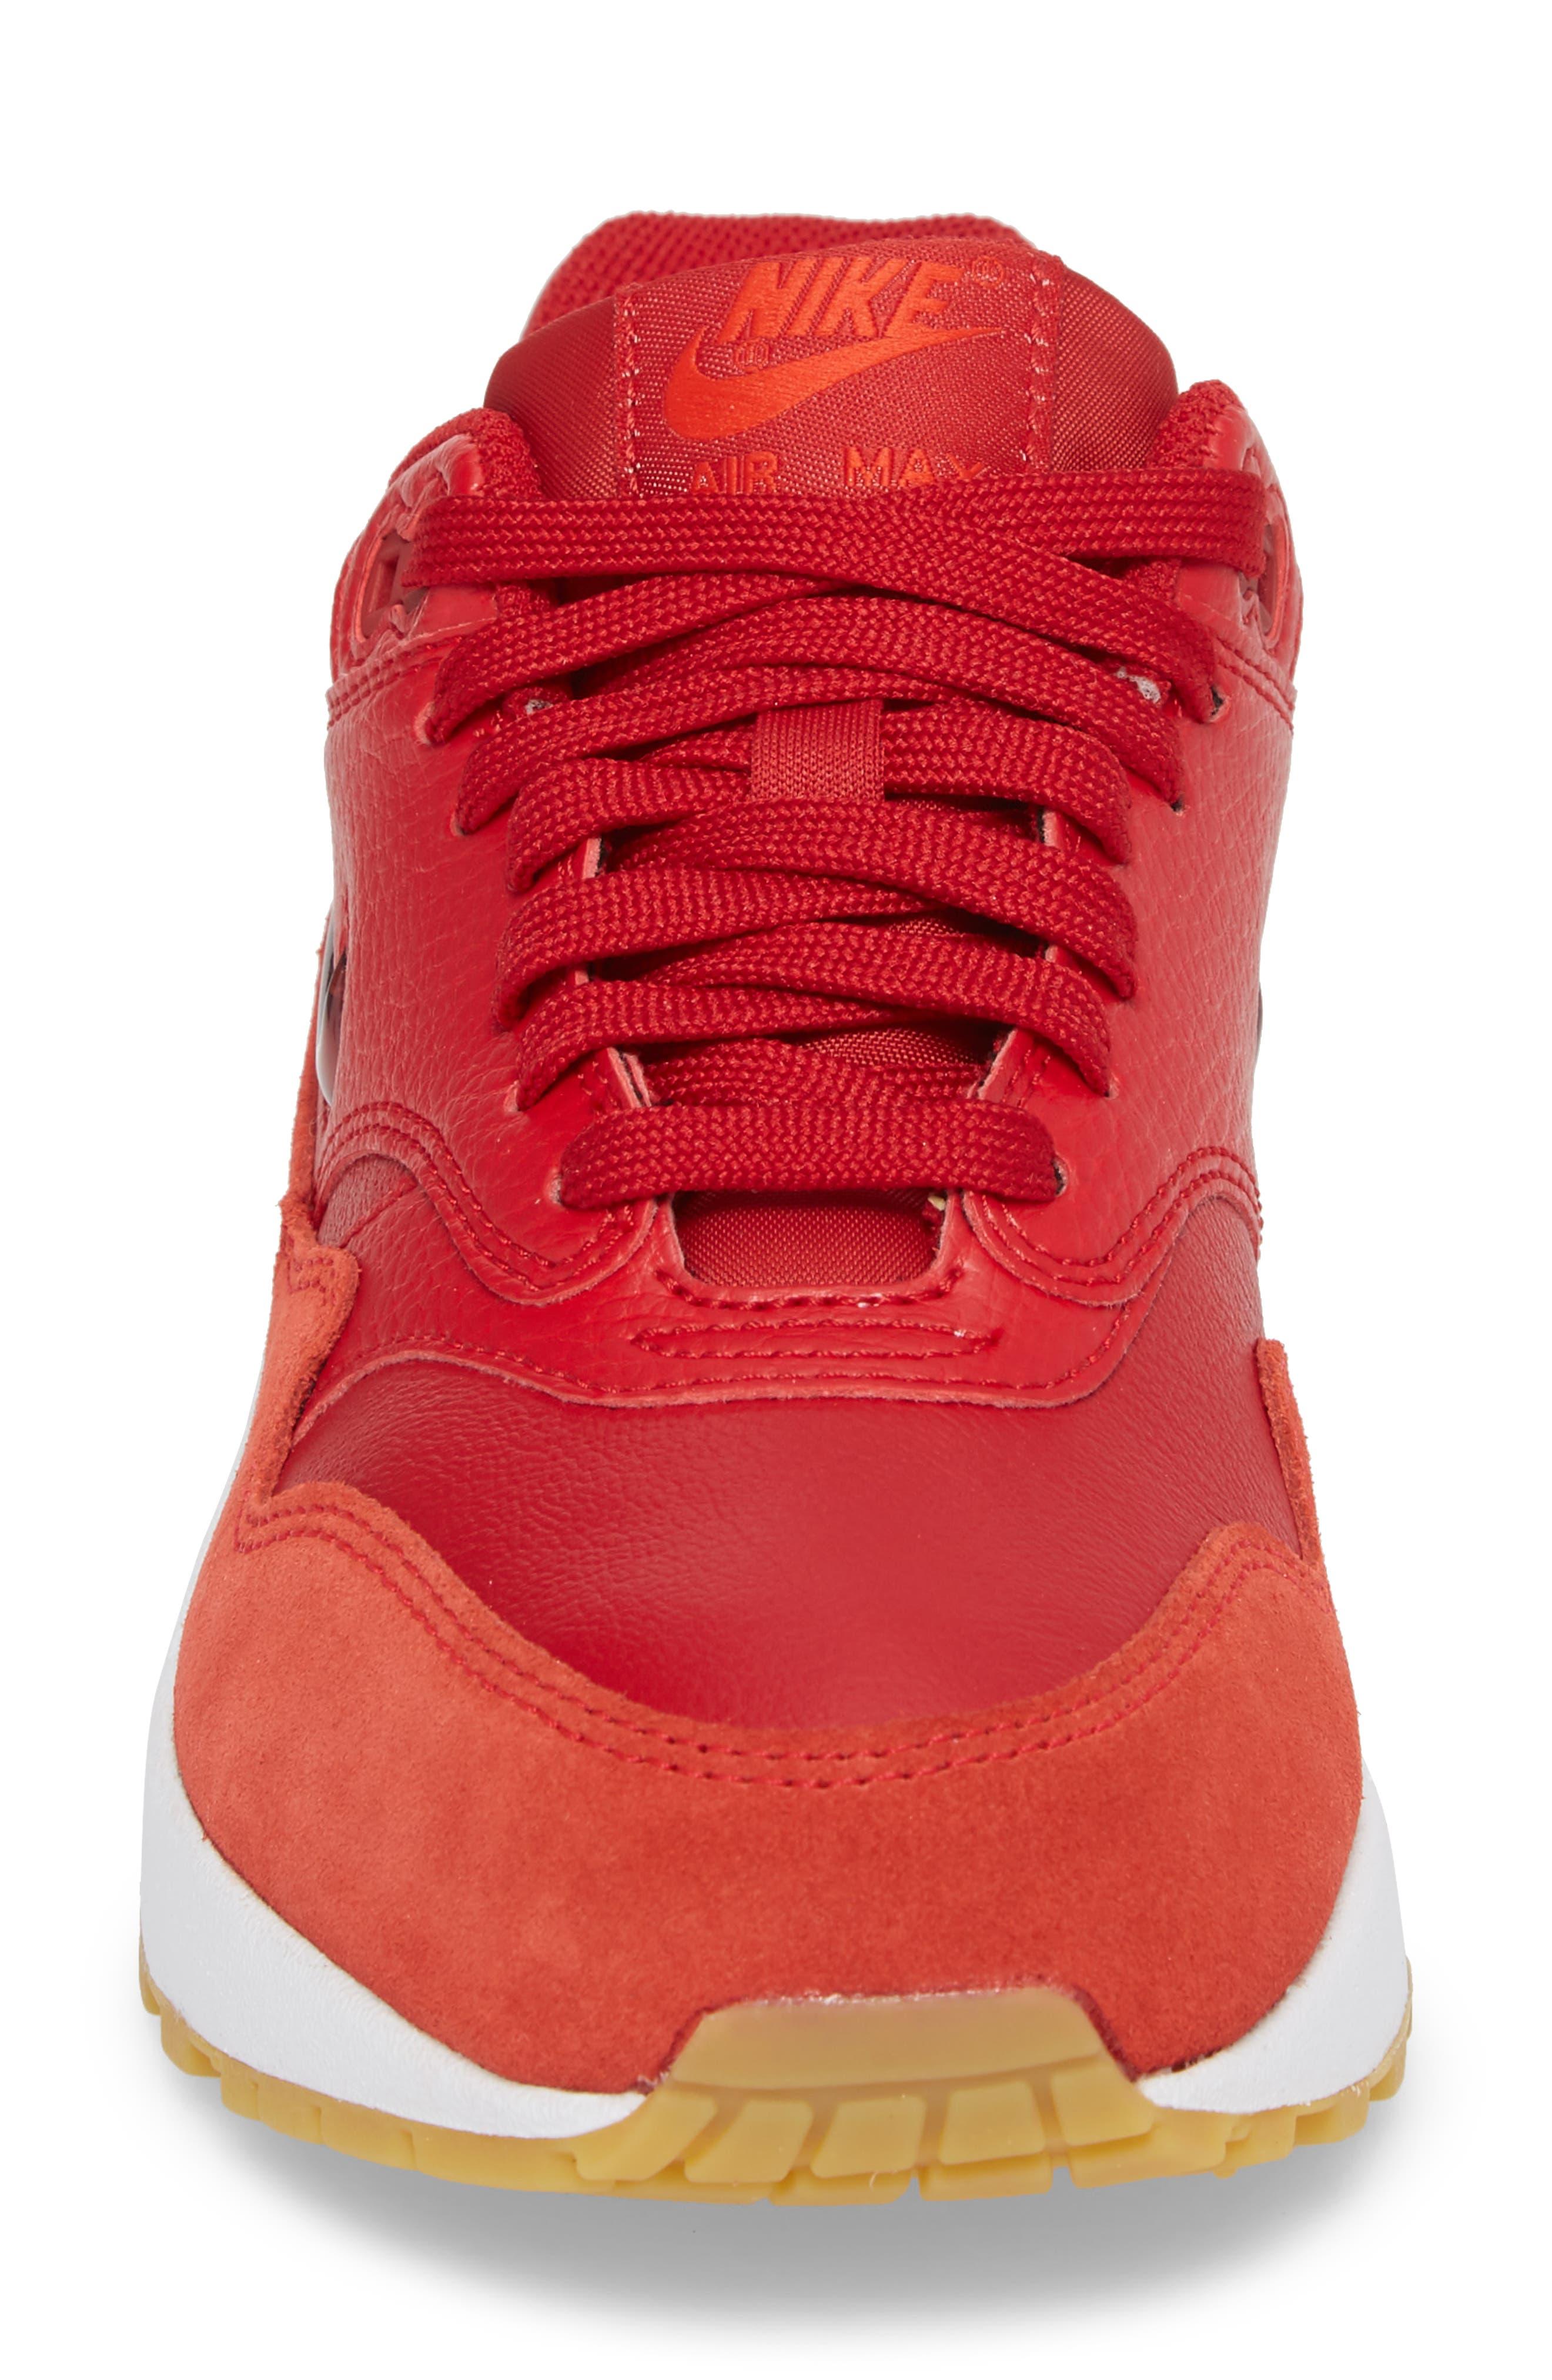 Air Max 1 Premium SC Sneaker,                             Alternate thumbnail 4, color,                             Gym Red/ Gym Red